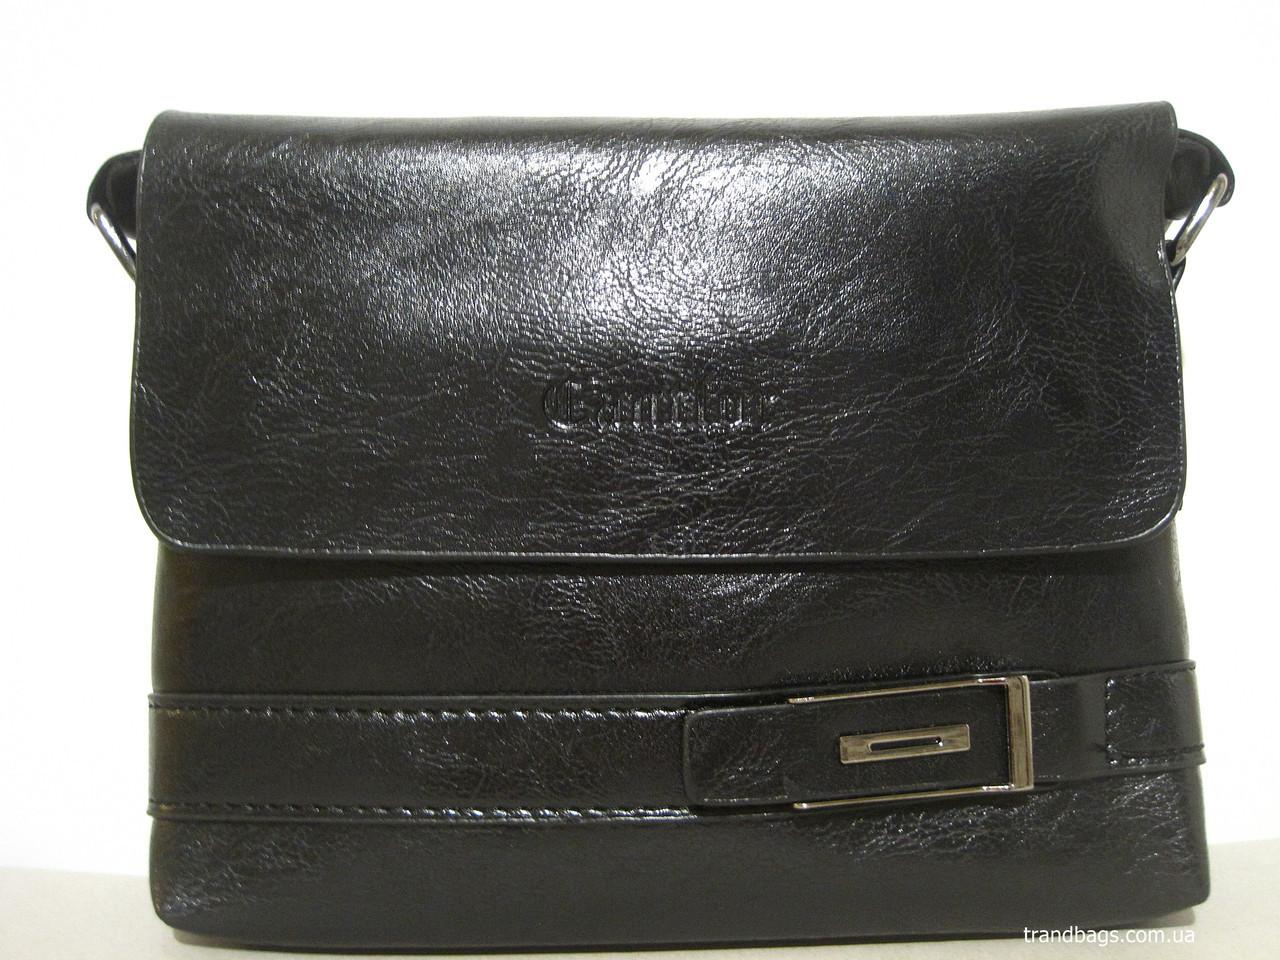 ddbdf065c9da Мужская сумка 108S-1 black CANTLOR мужская сумка на плечо не дорого Одесса  7 км